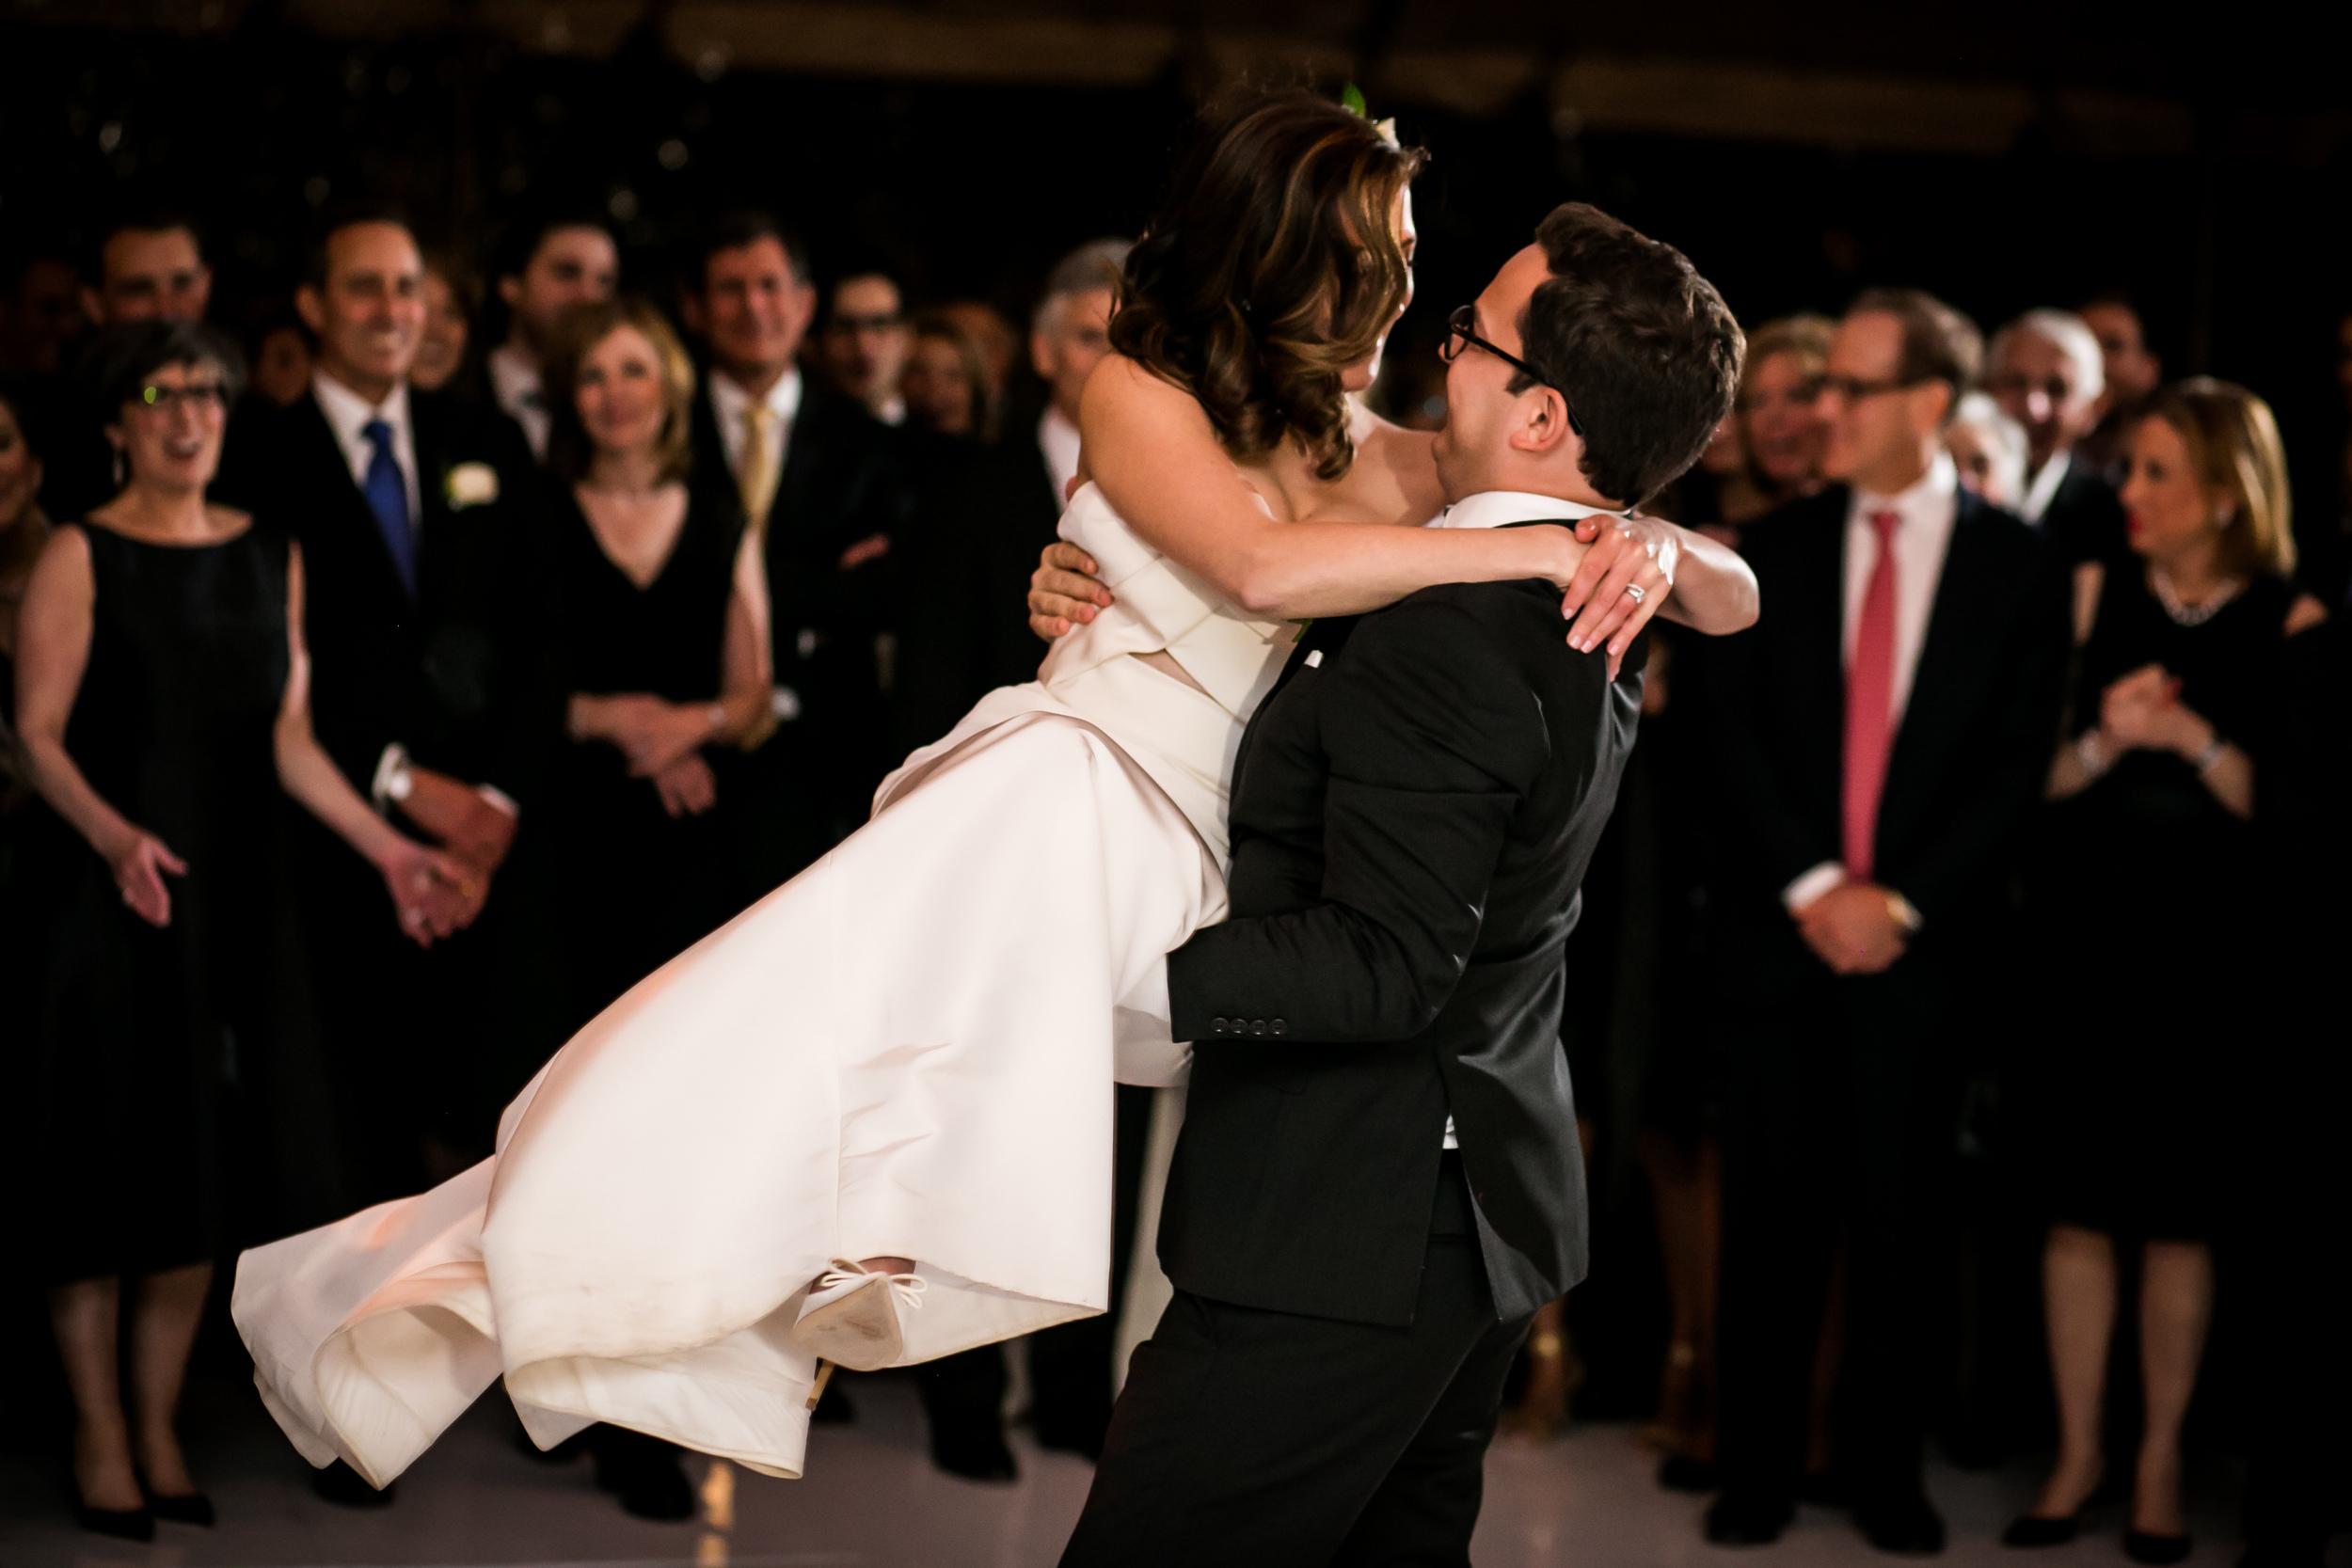 A wedding dance lift at the Chicago Botanic Garden